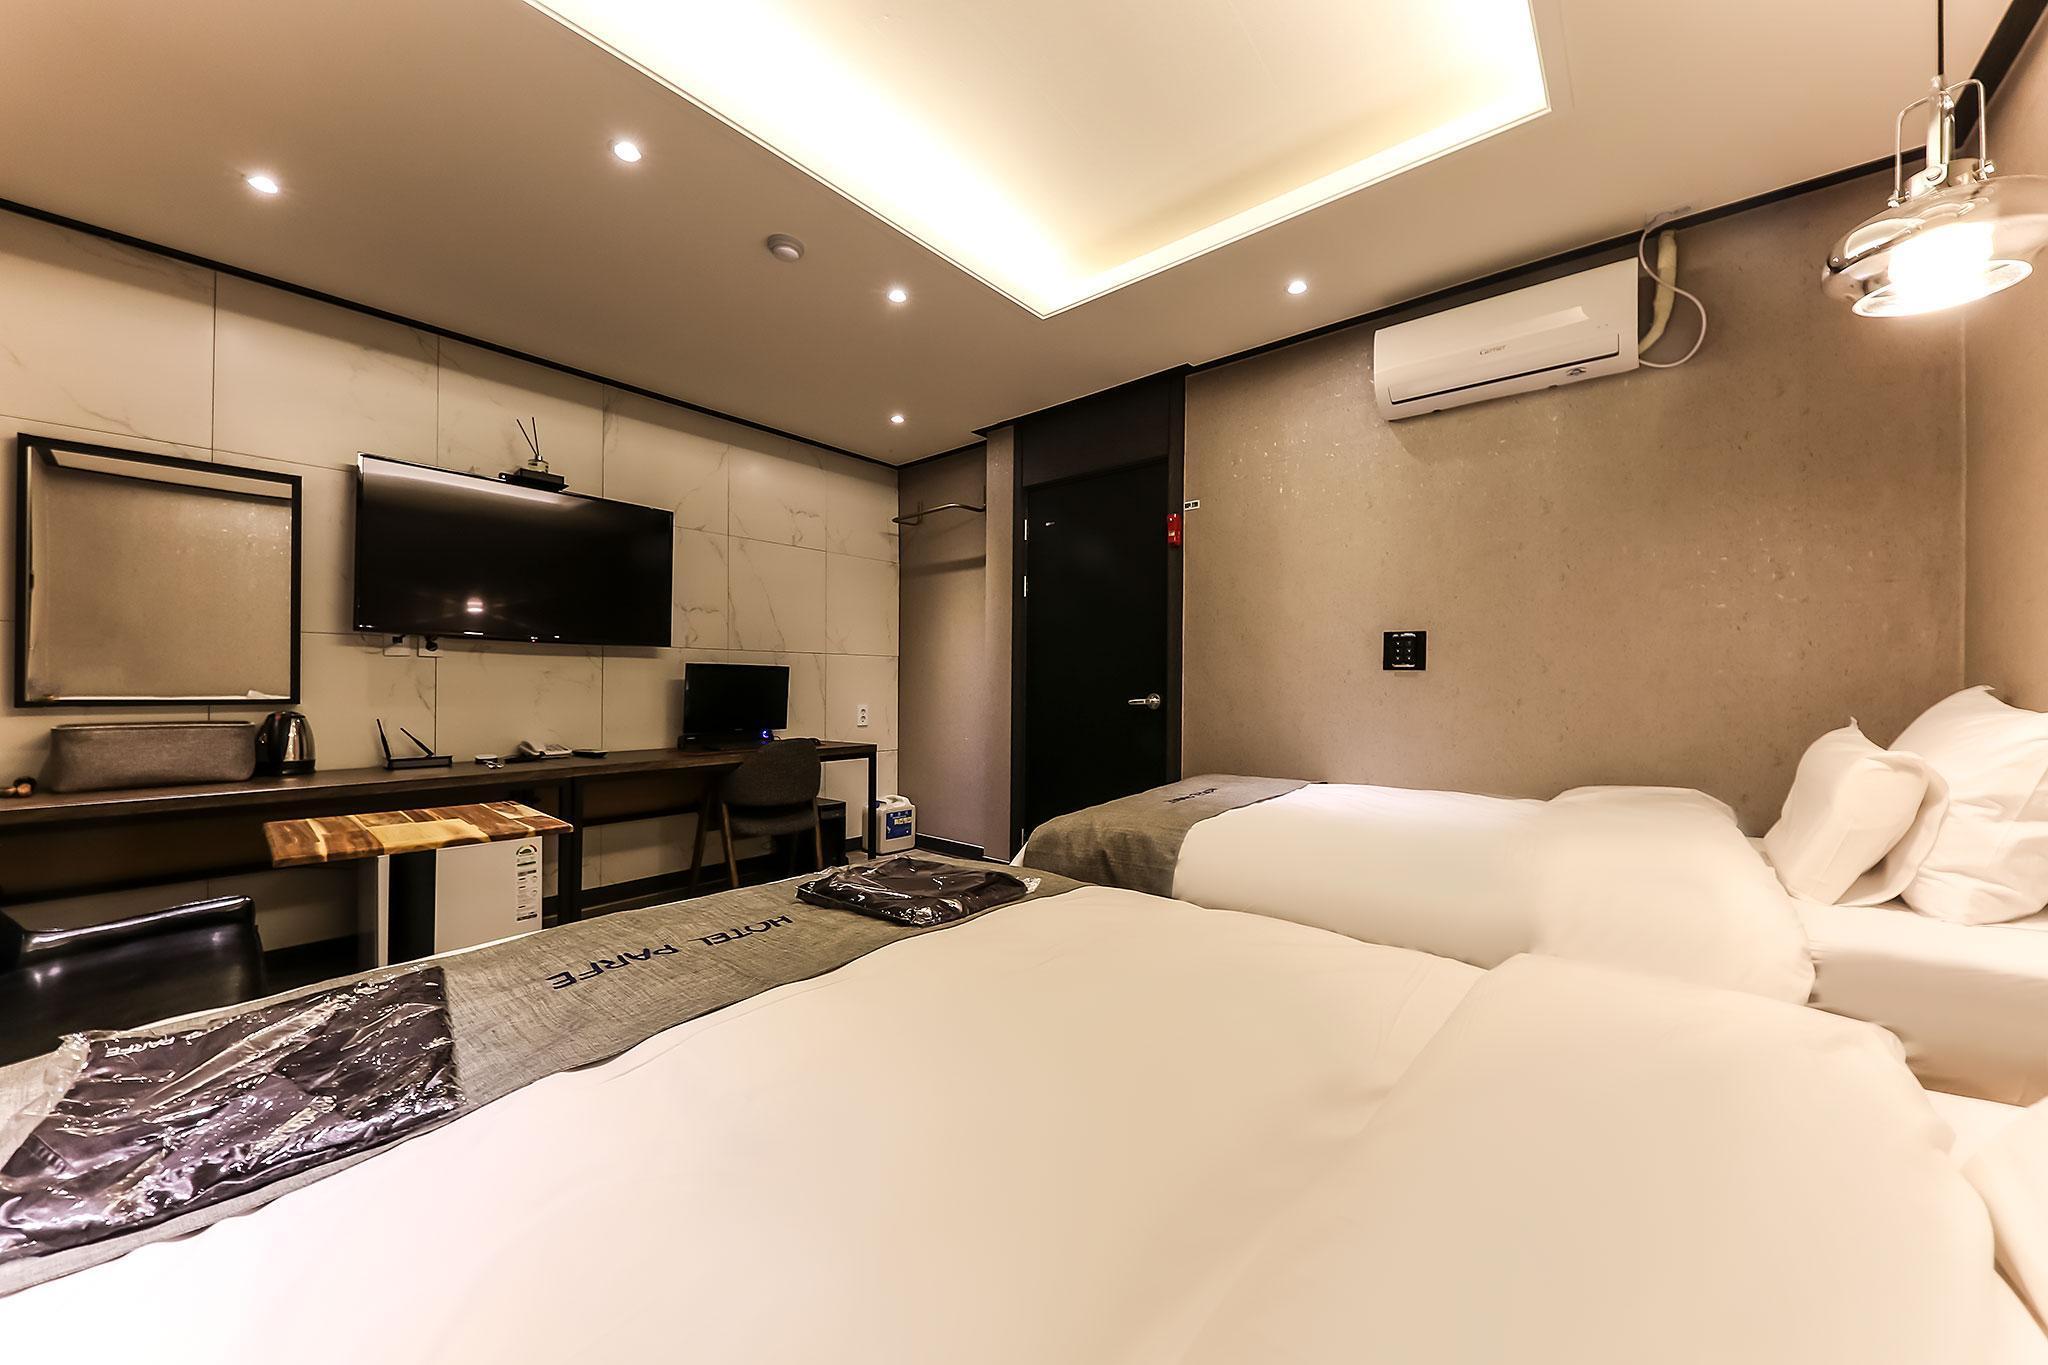 Hotel Parfe, Cheonan